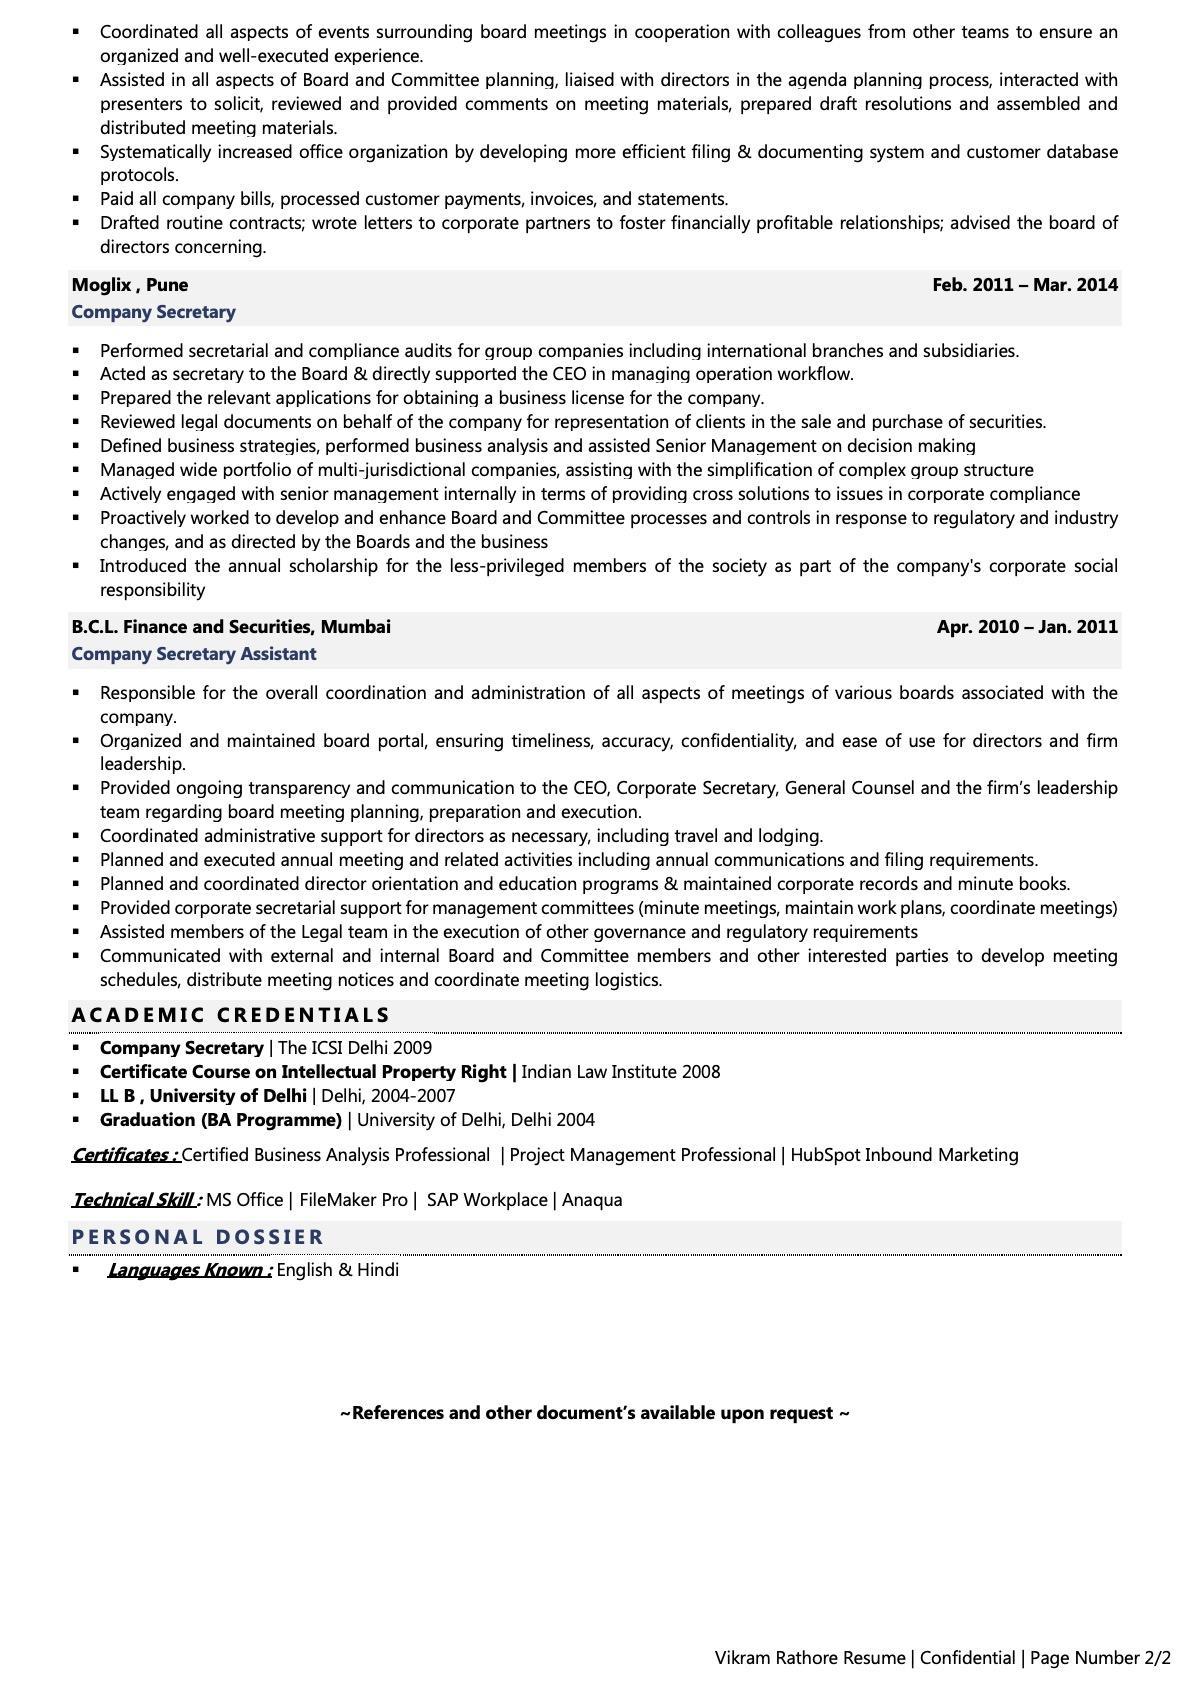 Company Secretary - Resume Example & Template